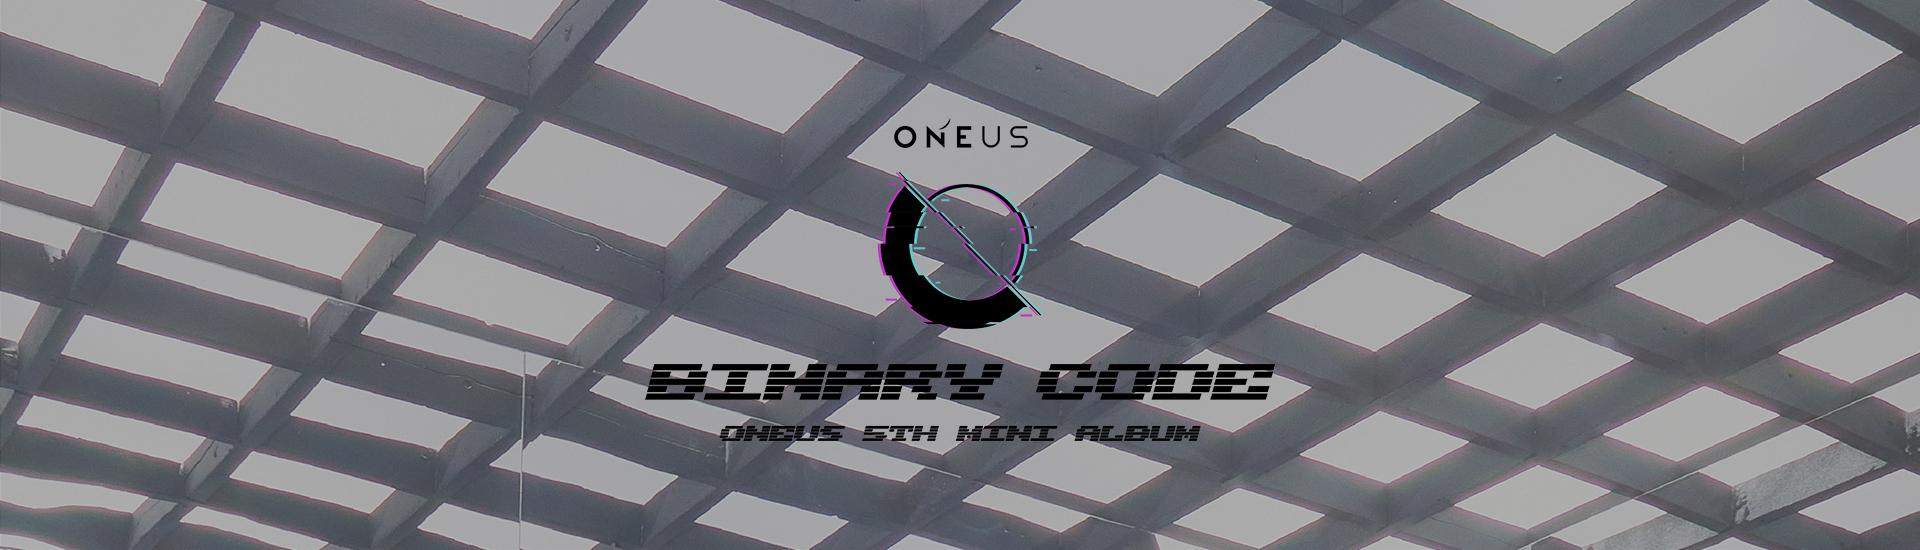 ONEUS - 5th Mini Album [BINARY CODE]